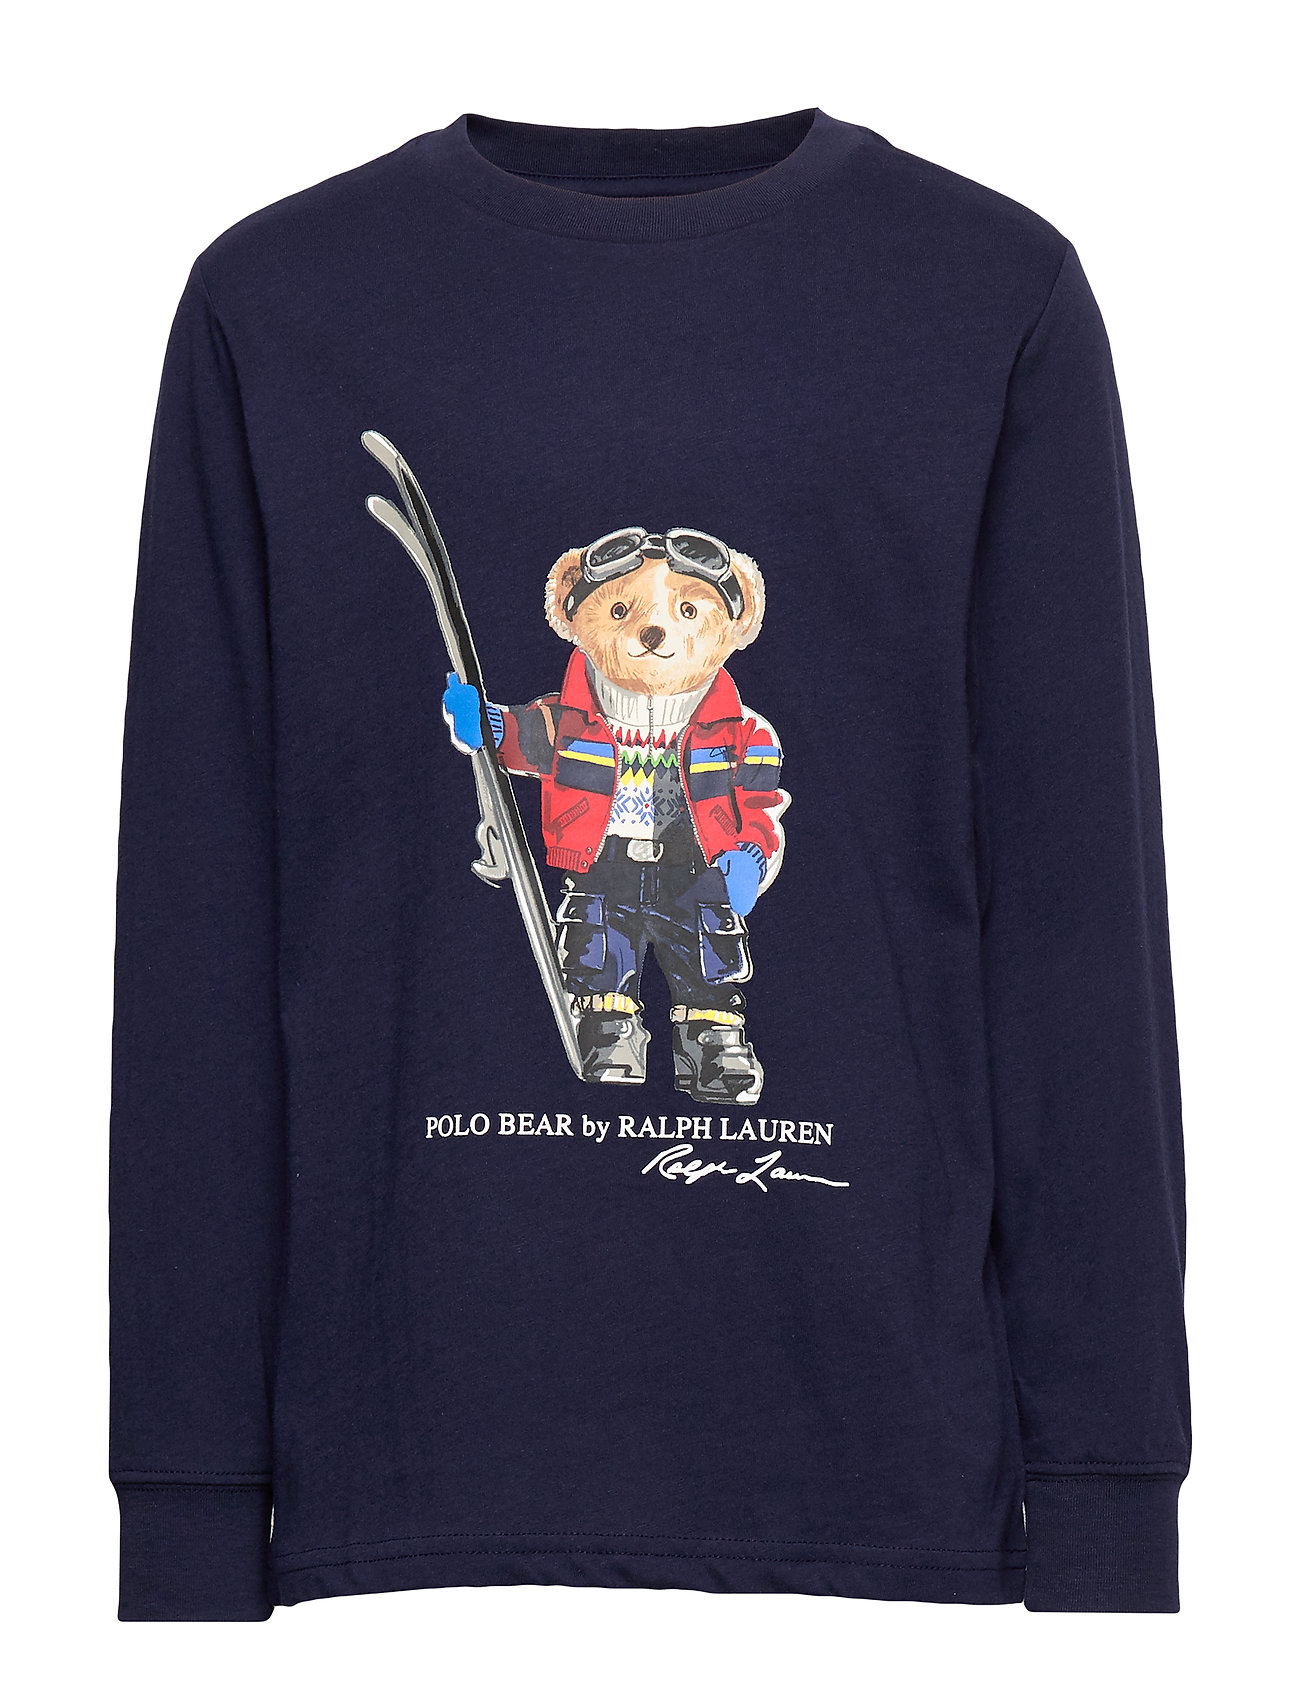 Ralph Lauren Kids LS CN-TOPS-T-SHIRT - FRENCH NAVY